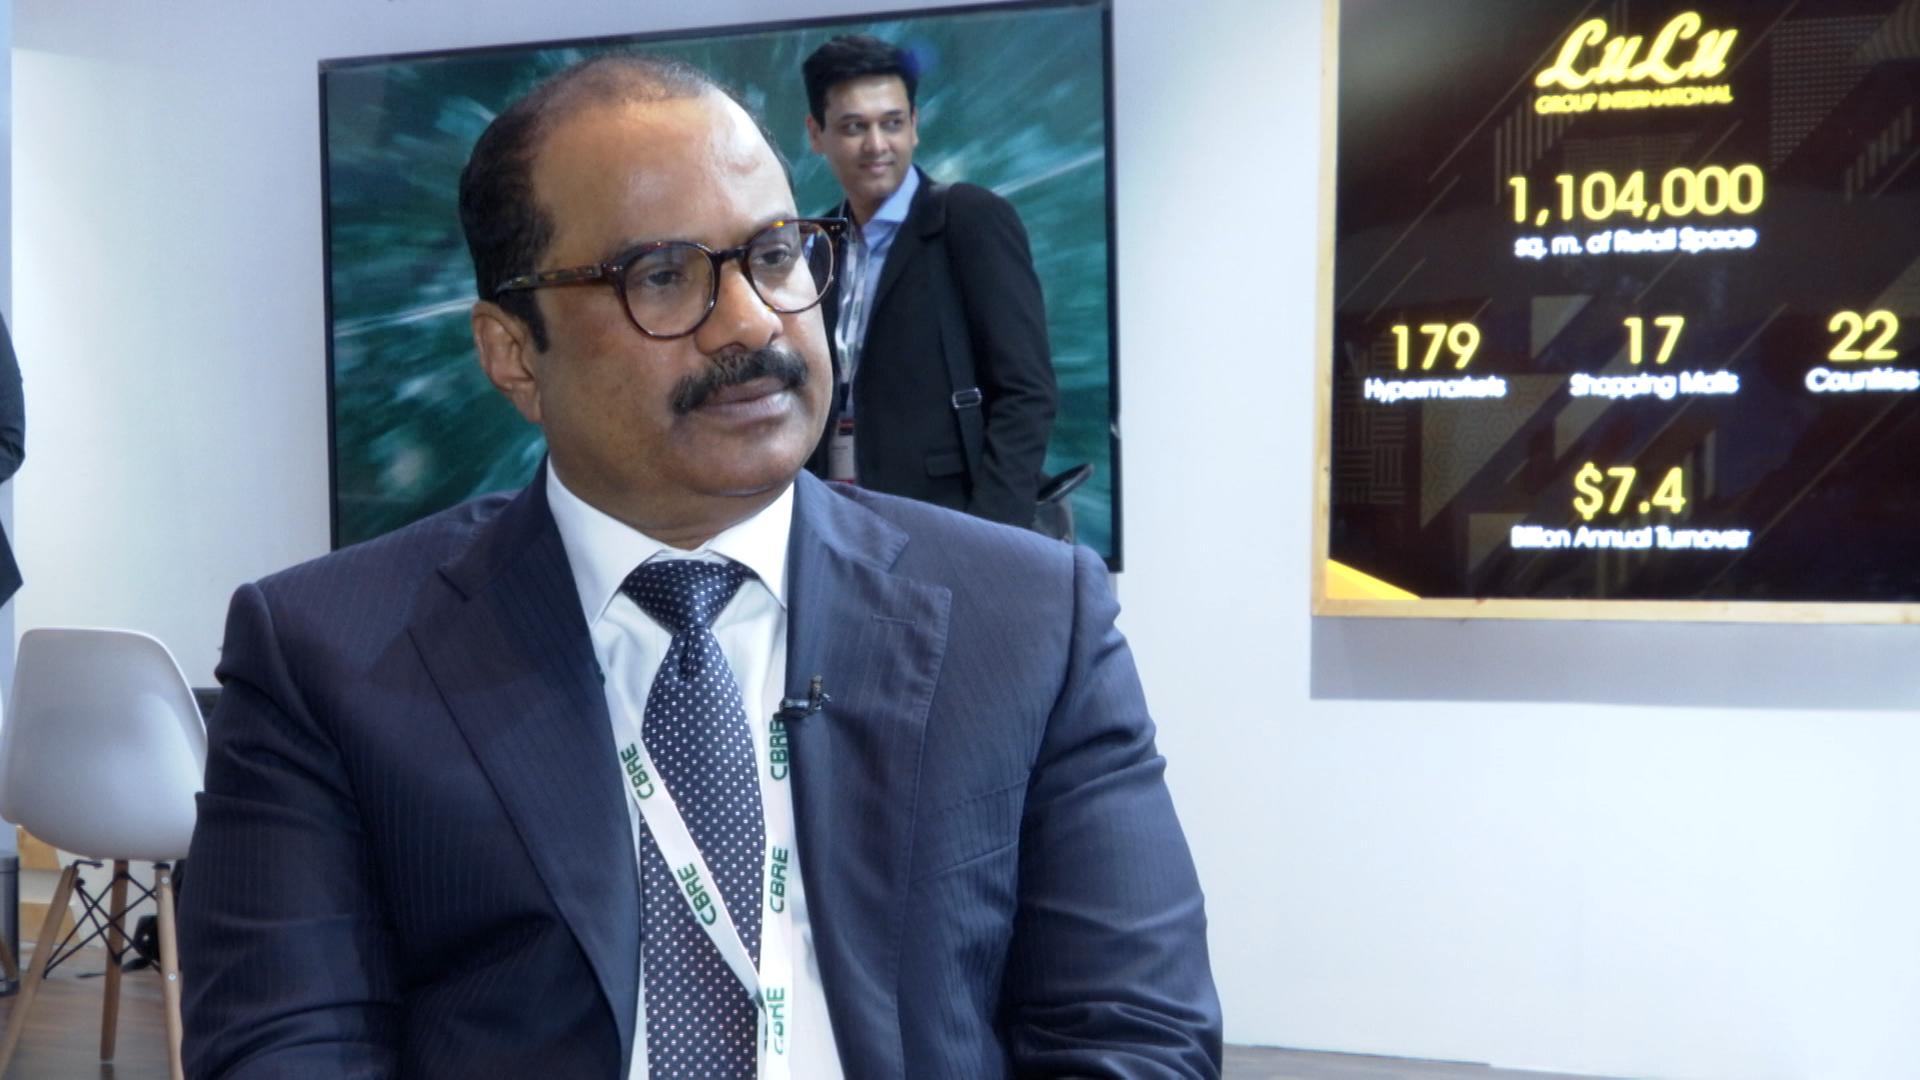 Lulu Group powering India's retail growth